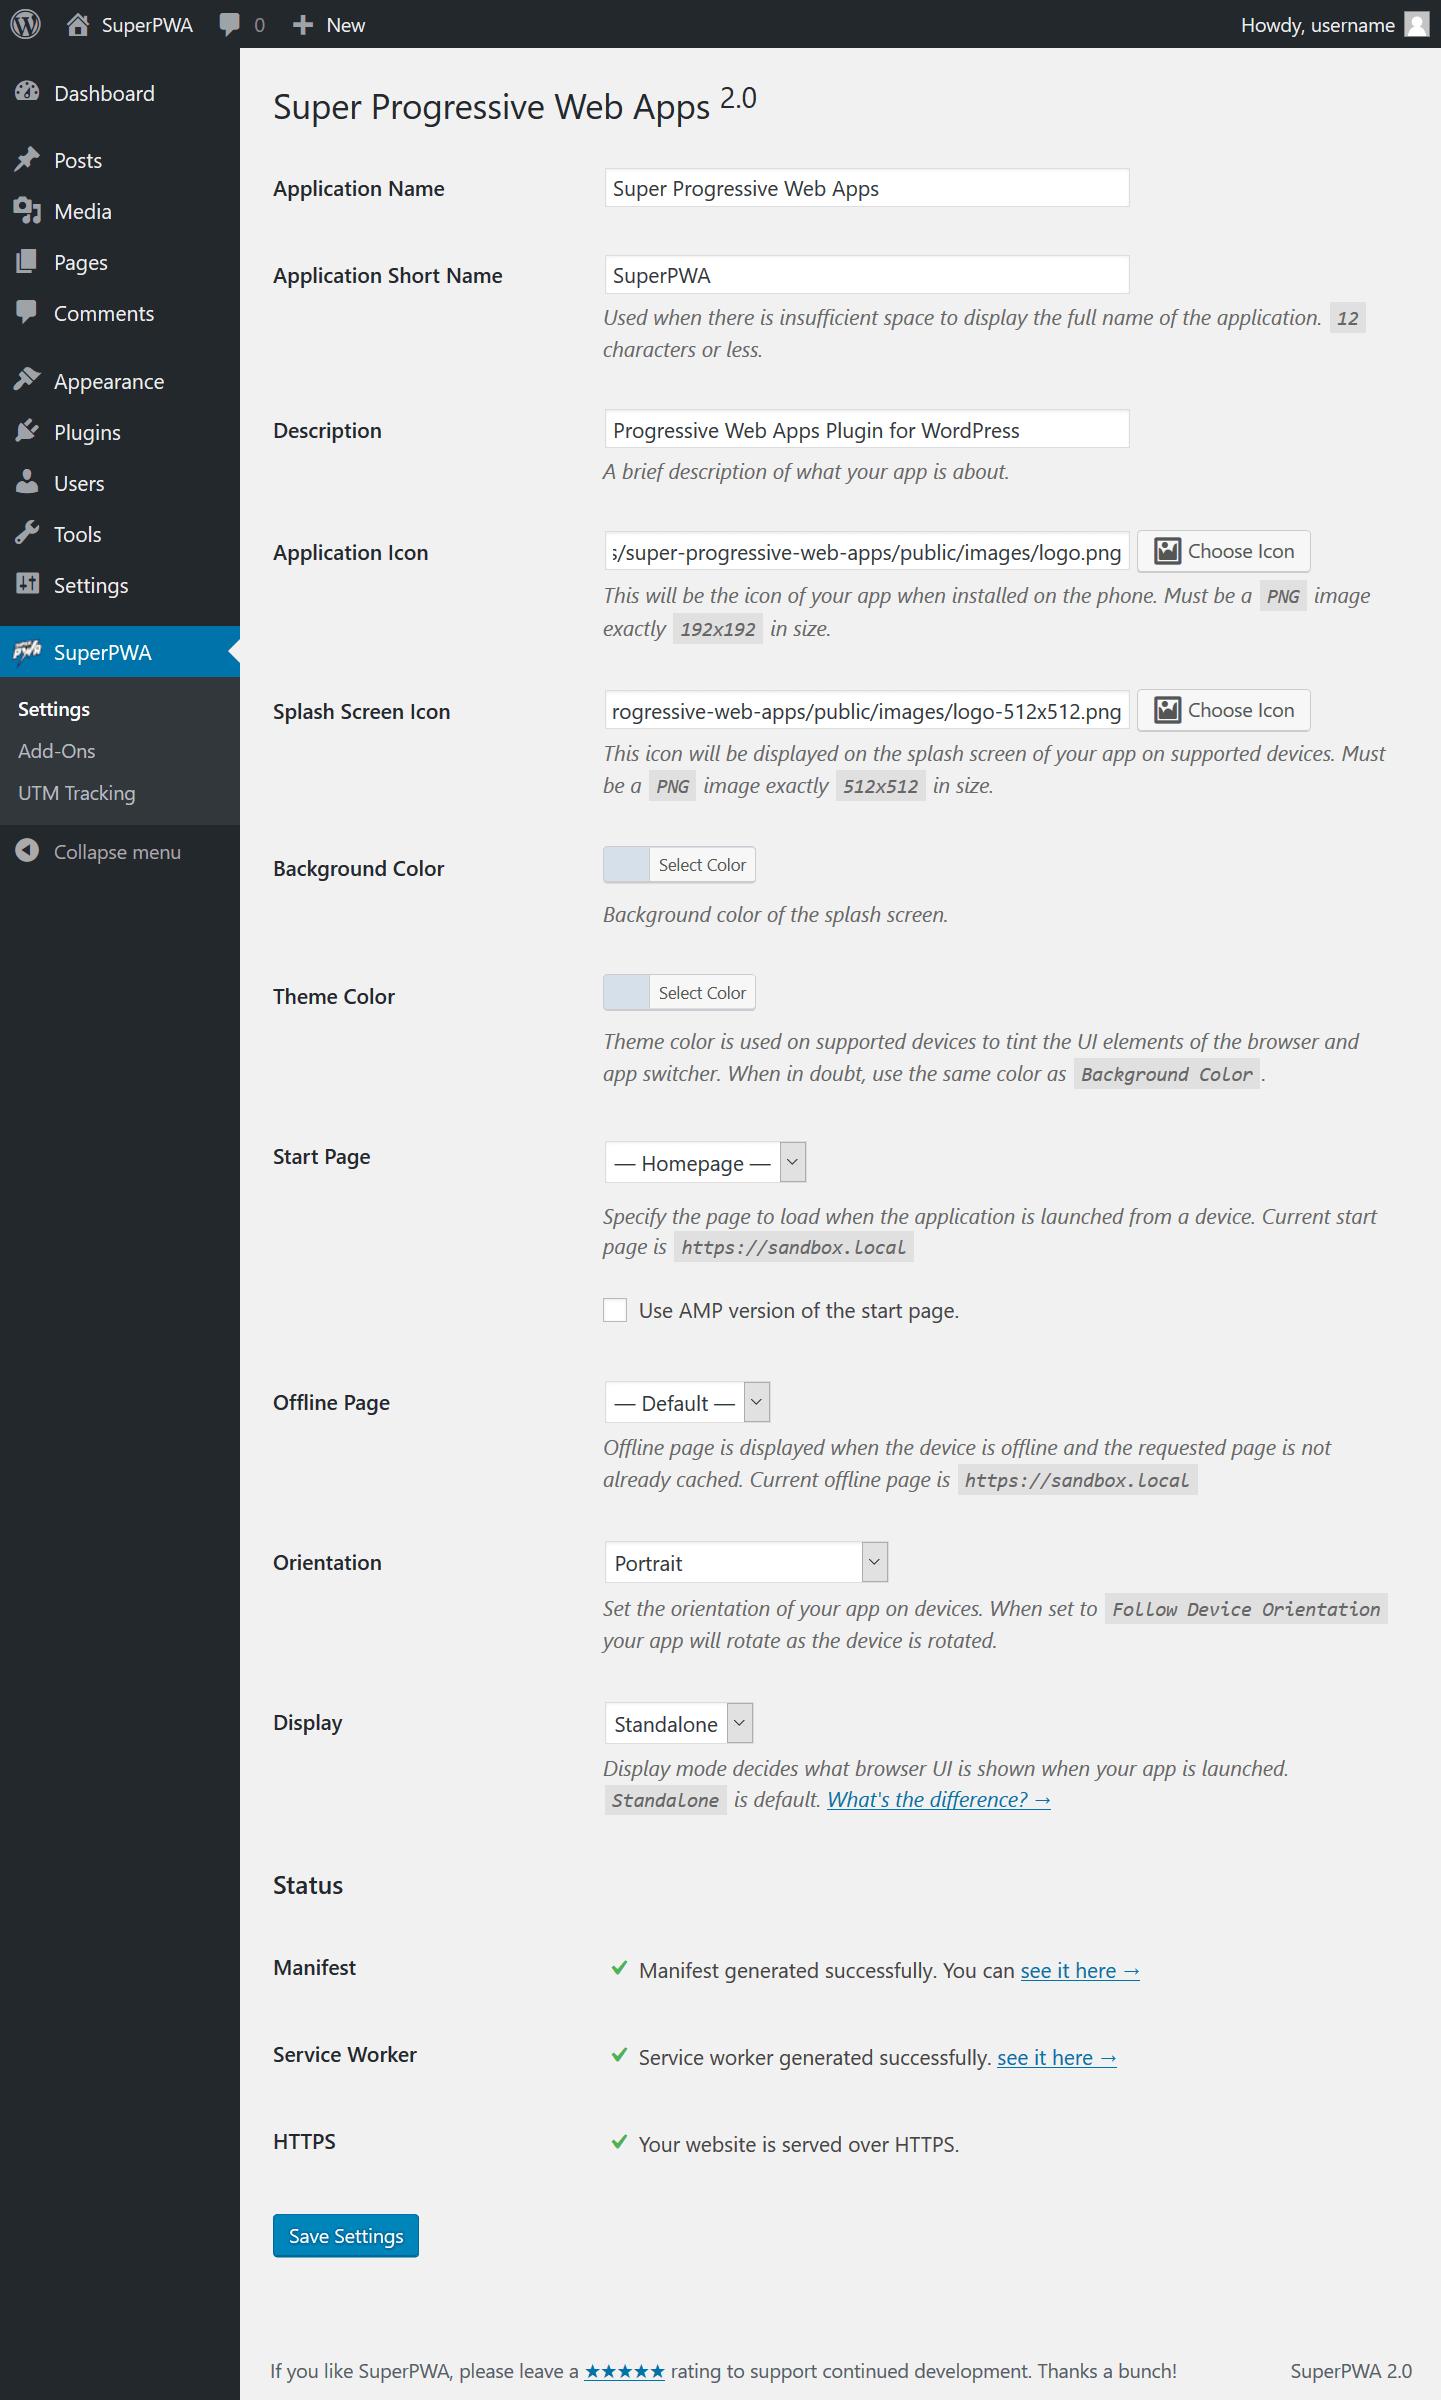 Settings page in WordPress Admin > Settings > SuperPWA